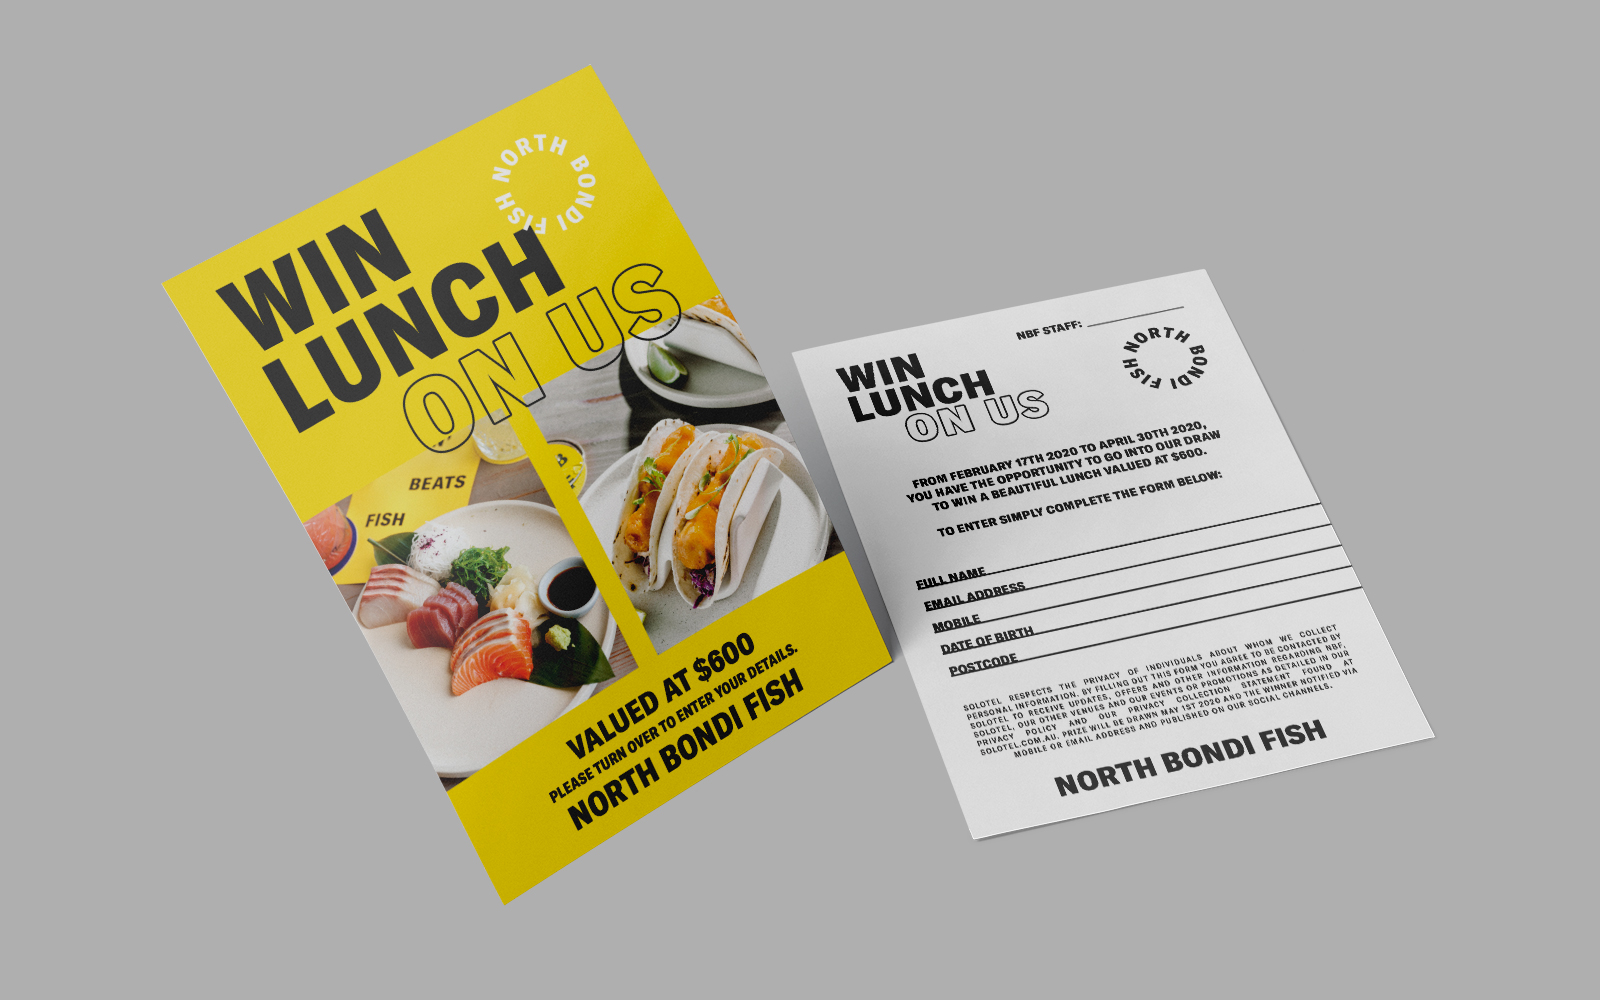 distil north bondi fish lunch competition flyer design